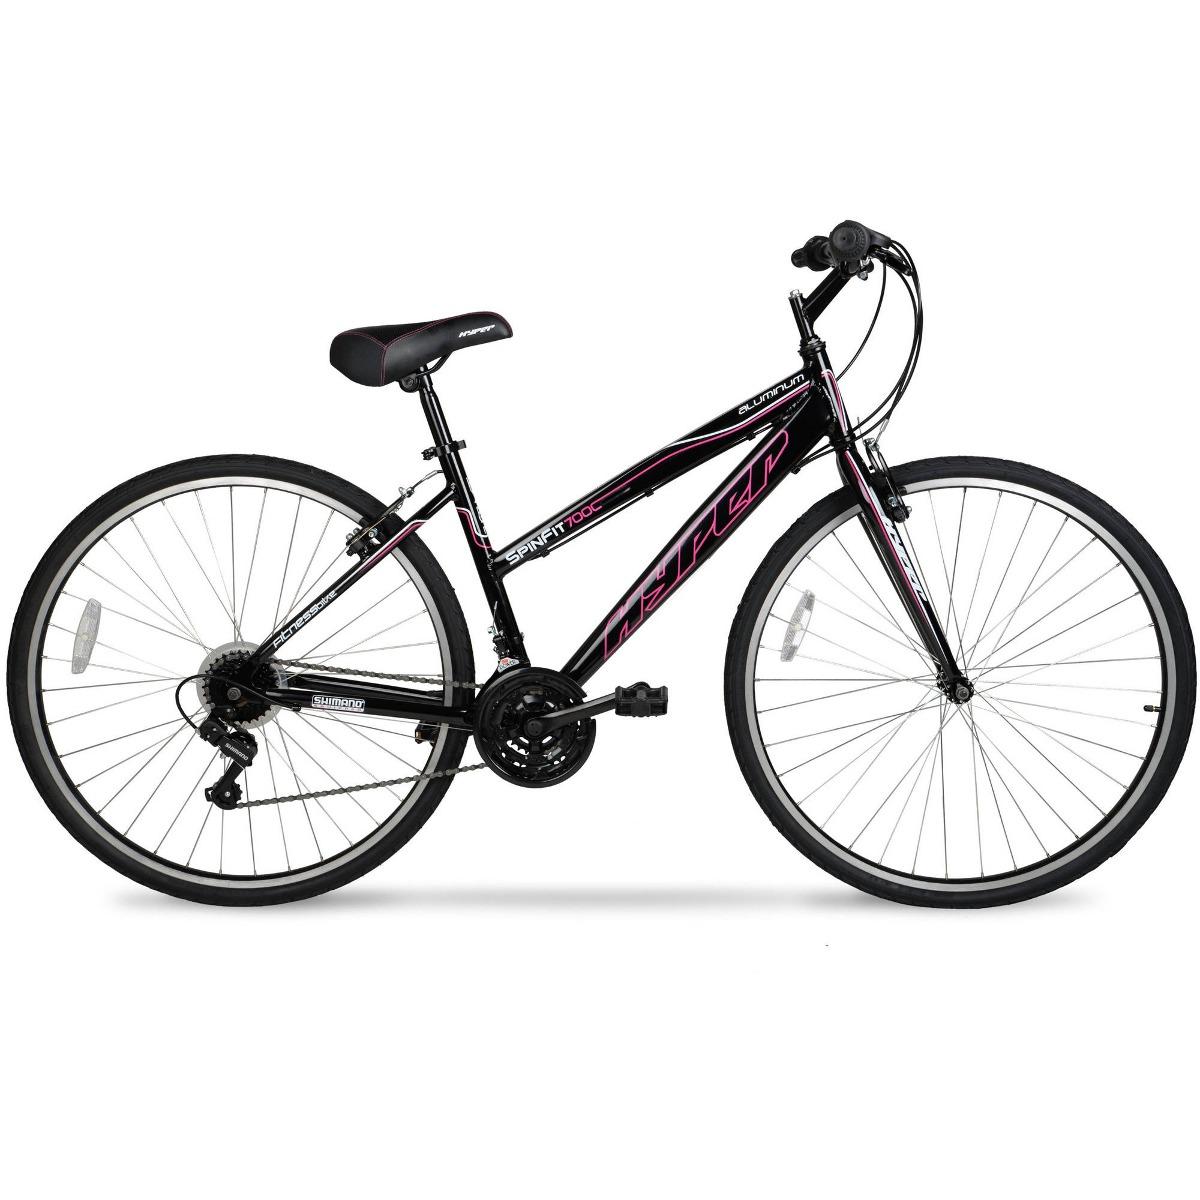 Bicicleta De 25\'\' Hyper Spinfit 700c Para Mujer - $ 1.091.900 en ...